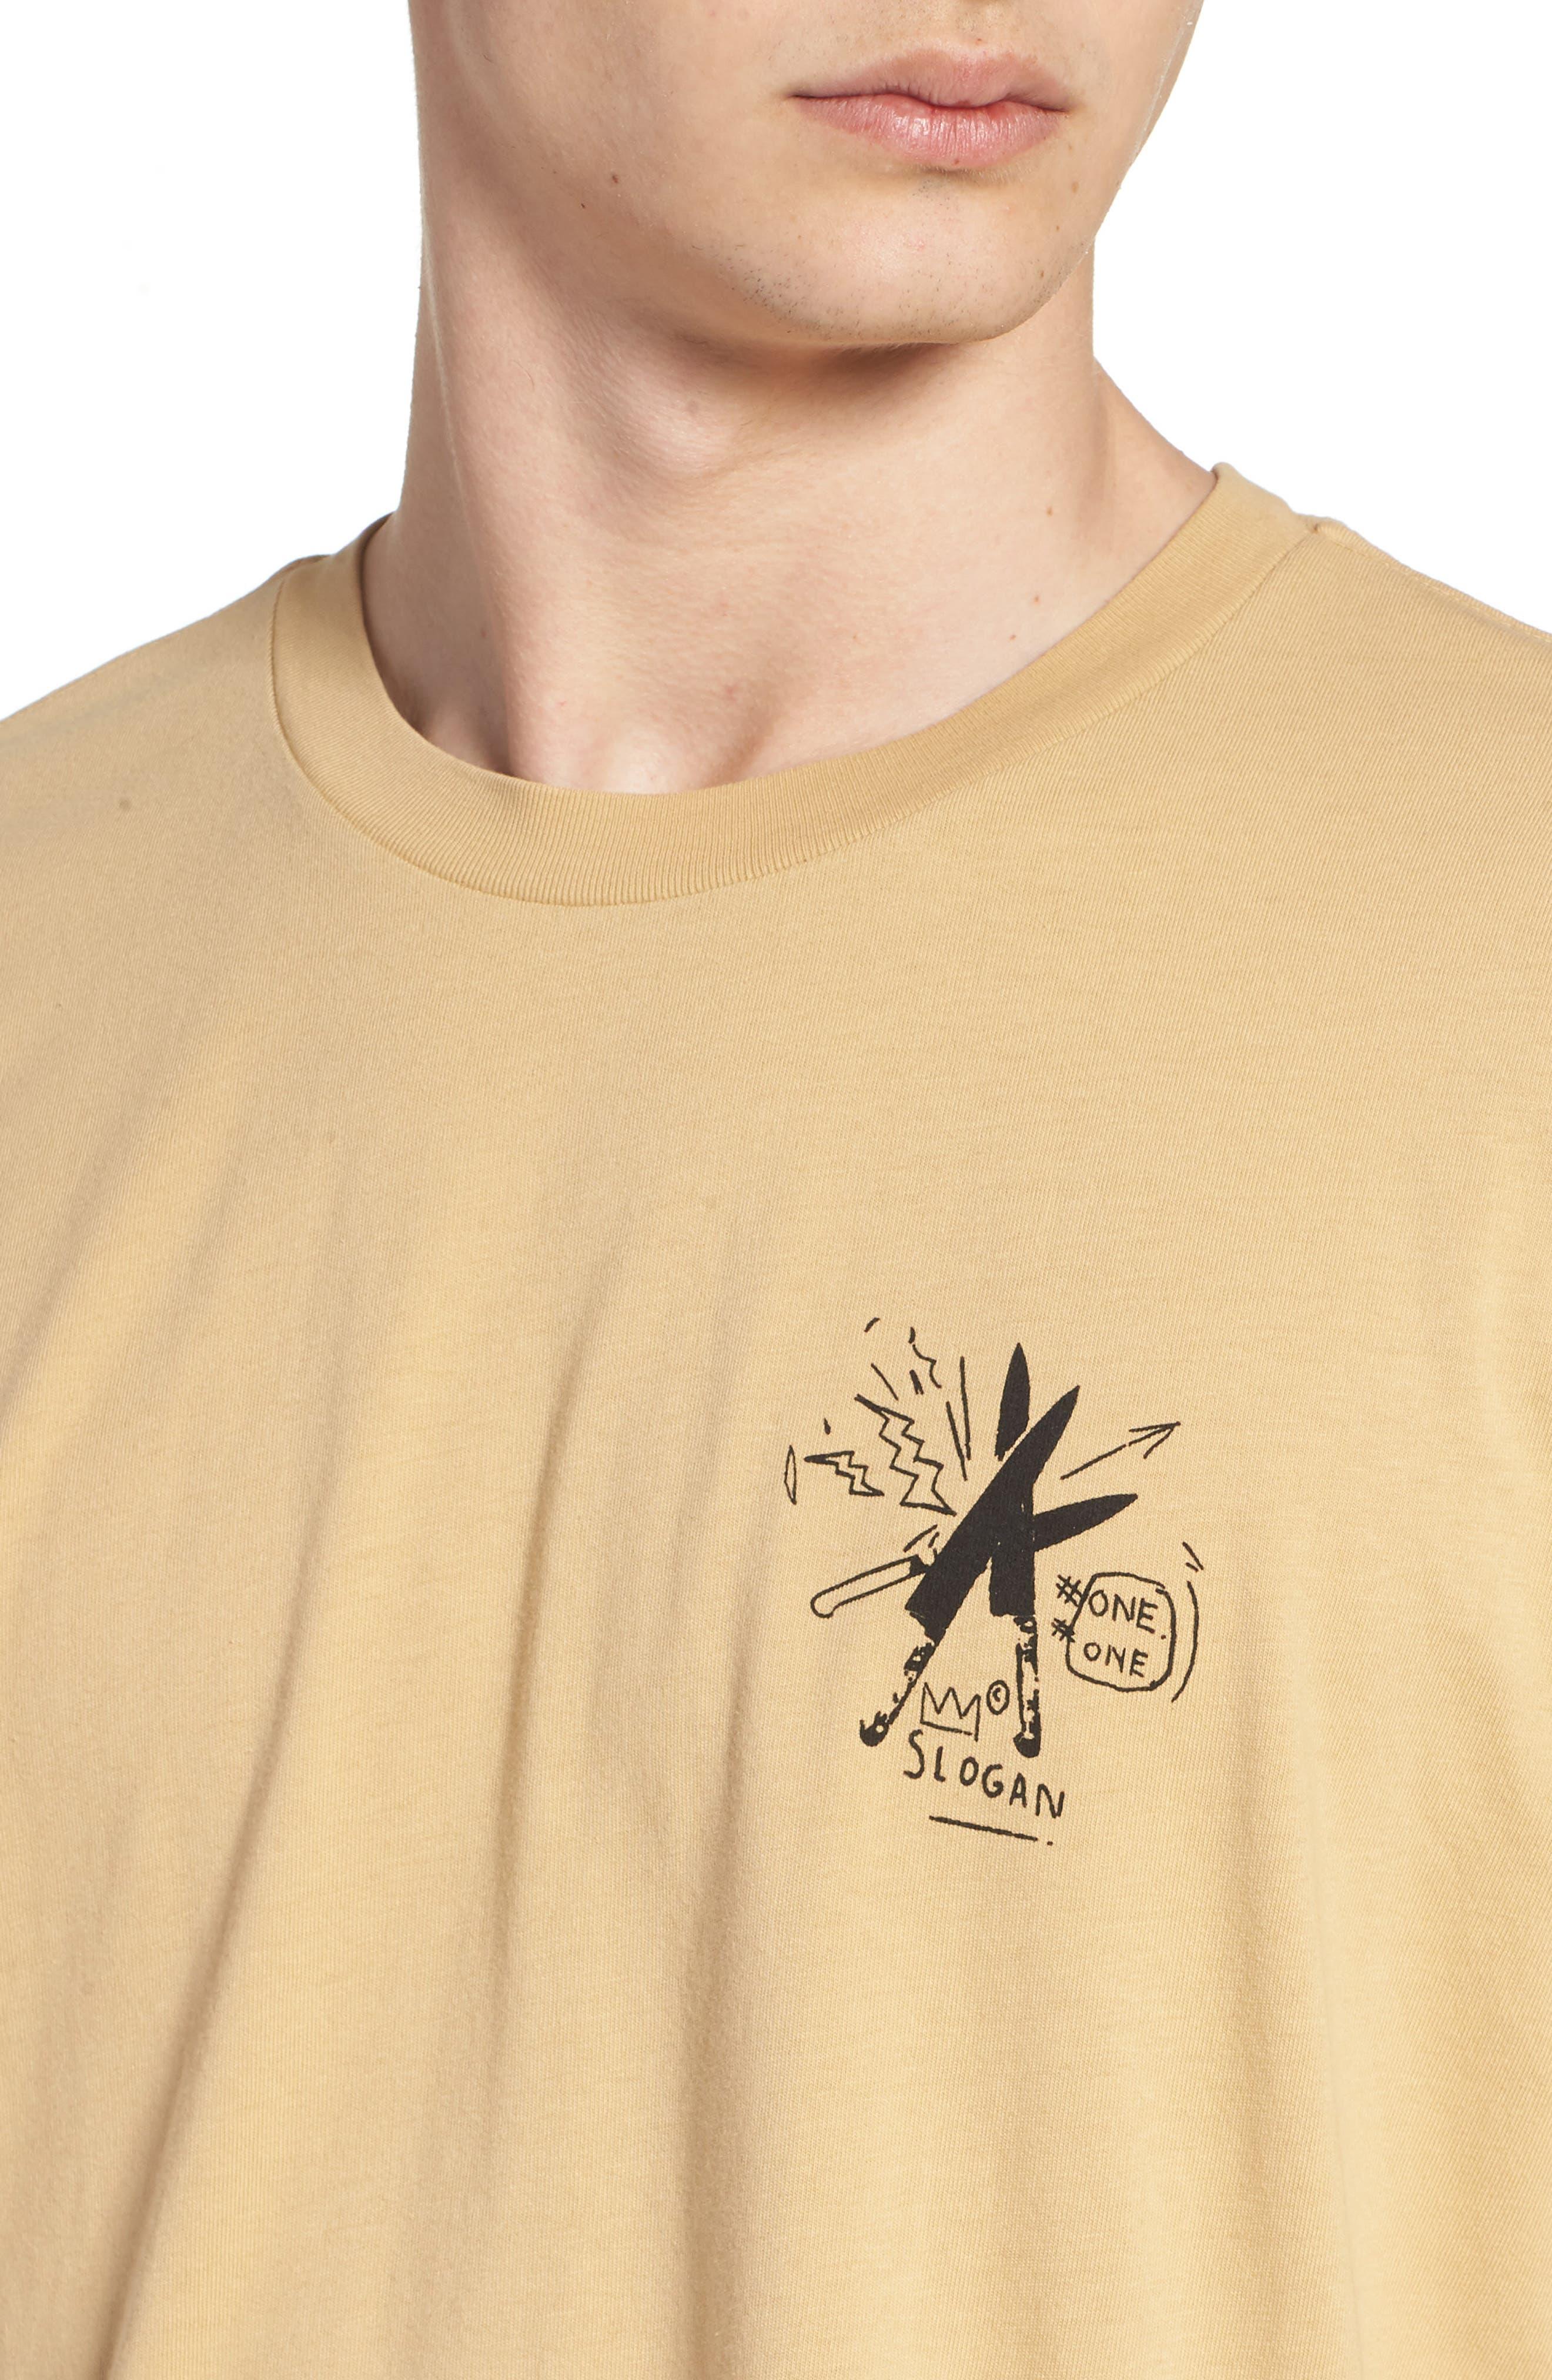 x Warhol Slogan T-Shirt,                             Alternate thumbnail 4, color,                             Straw